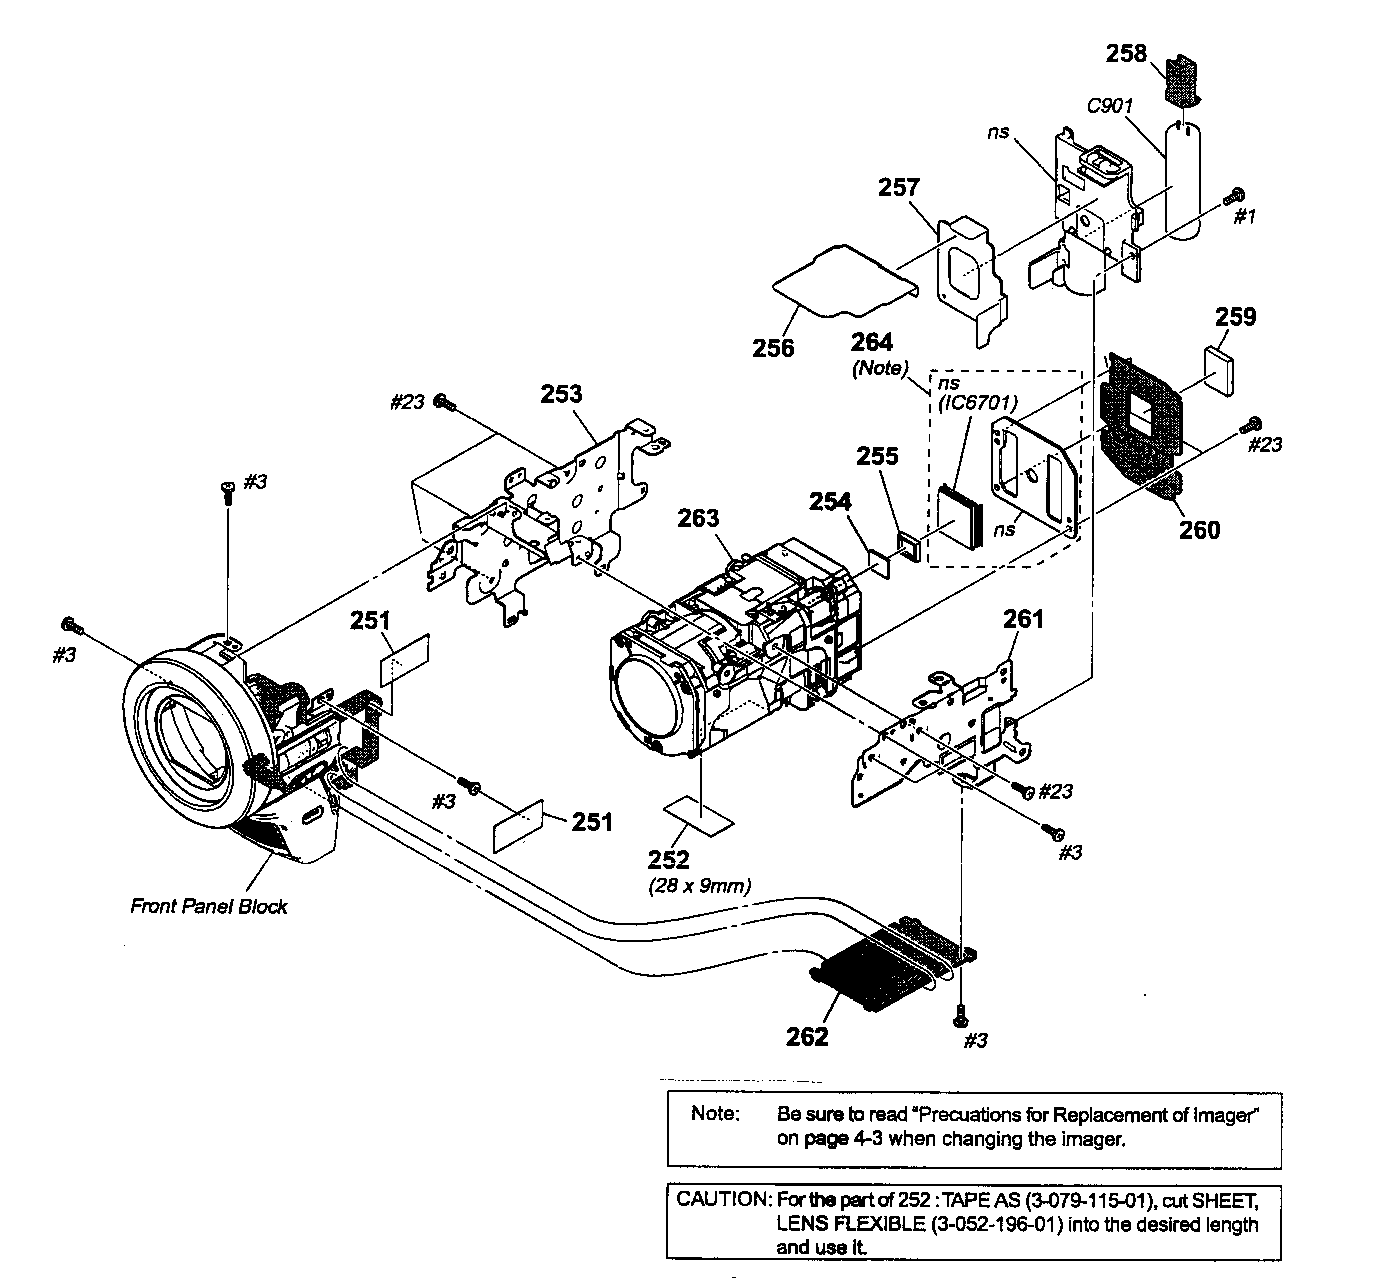 FRONT PANEL/LENS Diagram & Parts List for Model HDRHC9